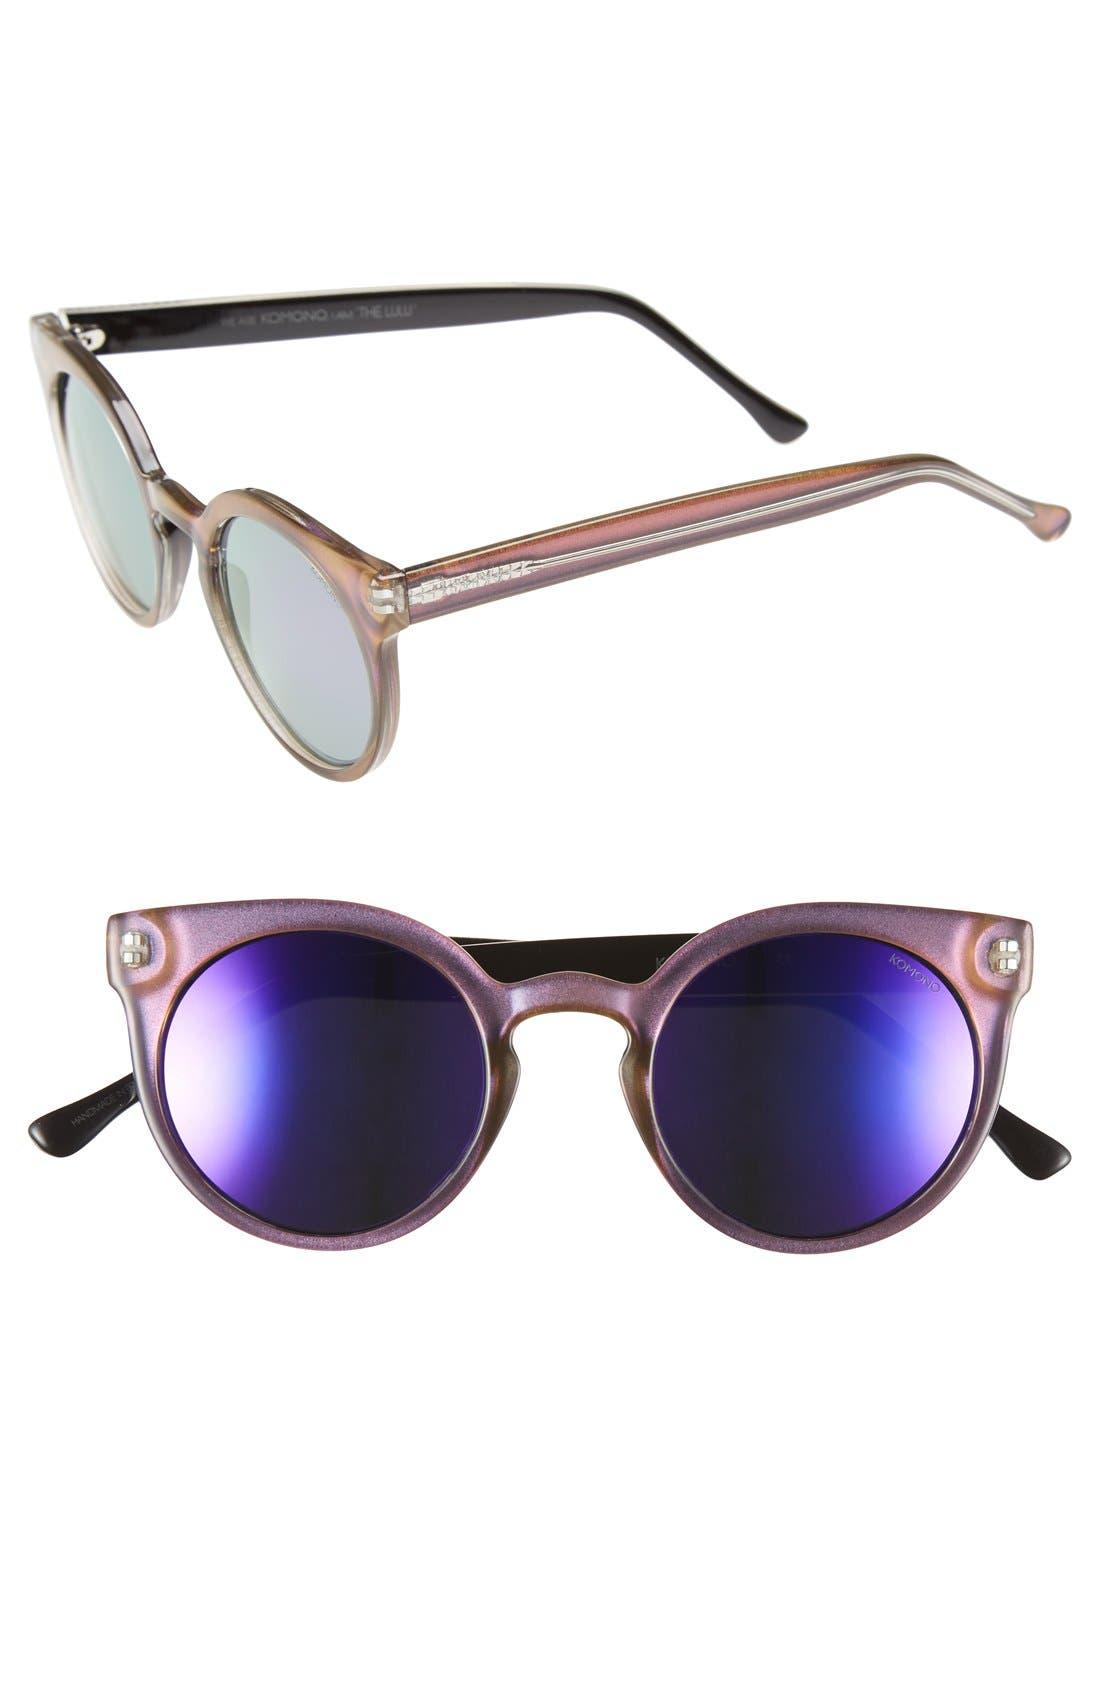 Alternate Image 1 Selected - Komono 'Lulu' Round Lens Sunglasses